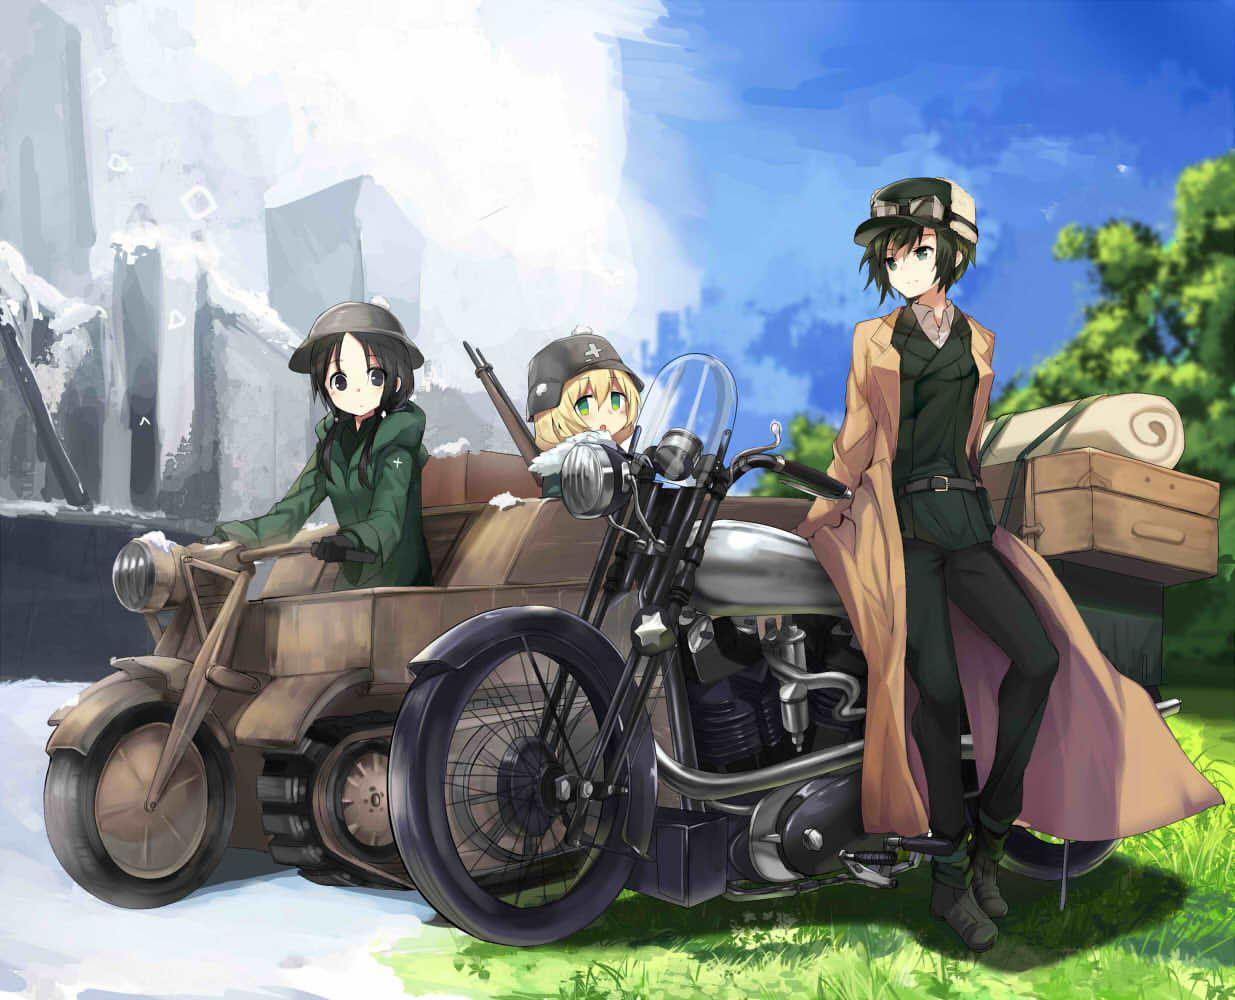 Shoujo Shuumatsu Ryokou Anime Friendship Anime Crossover Anime